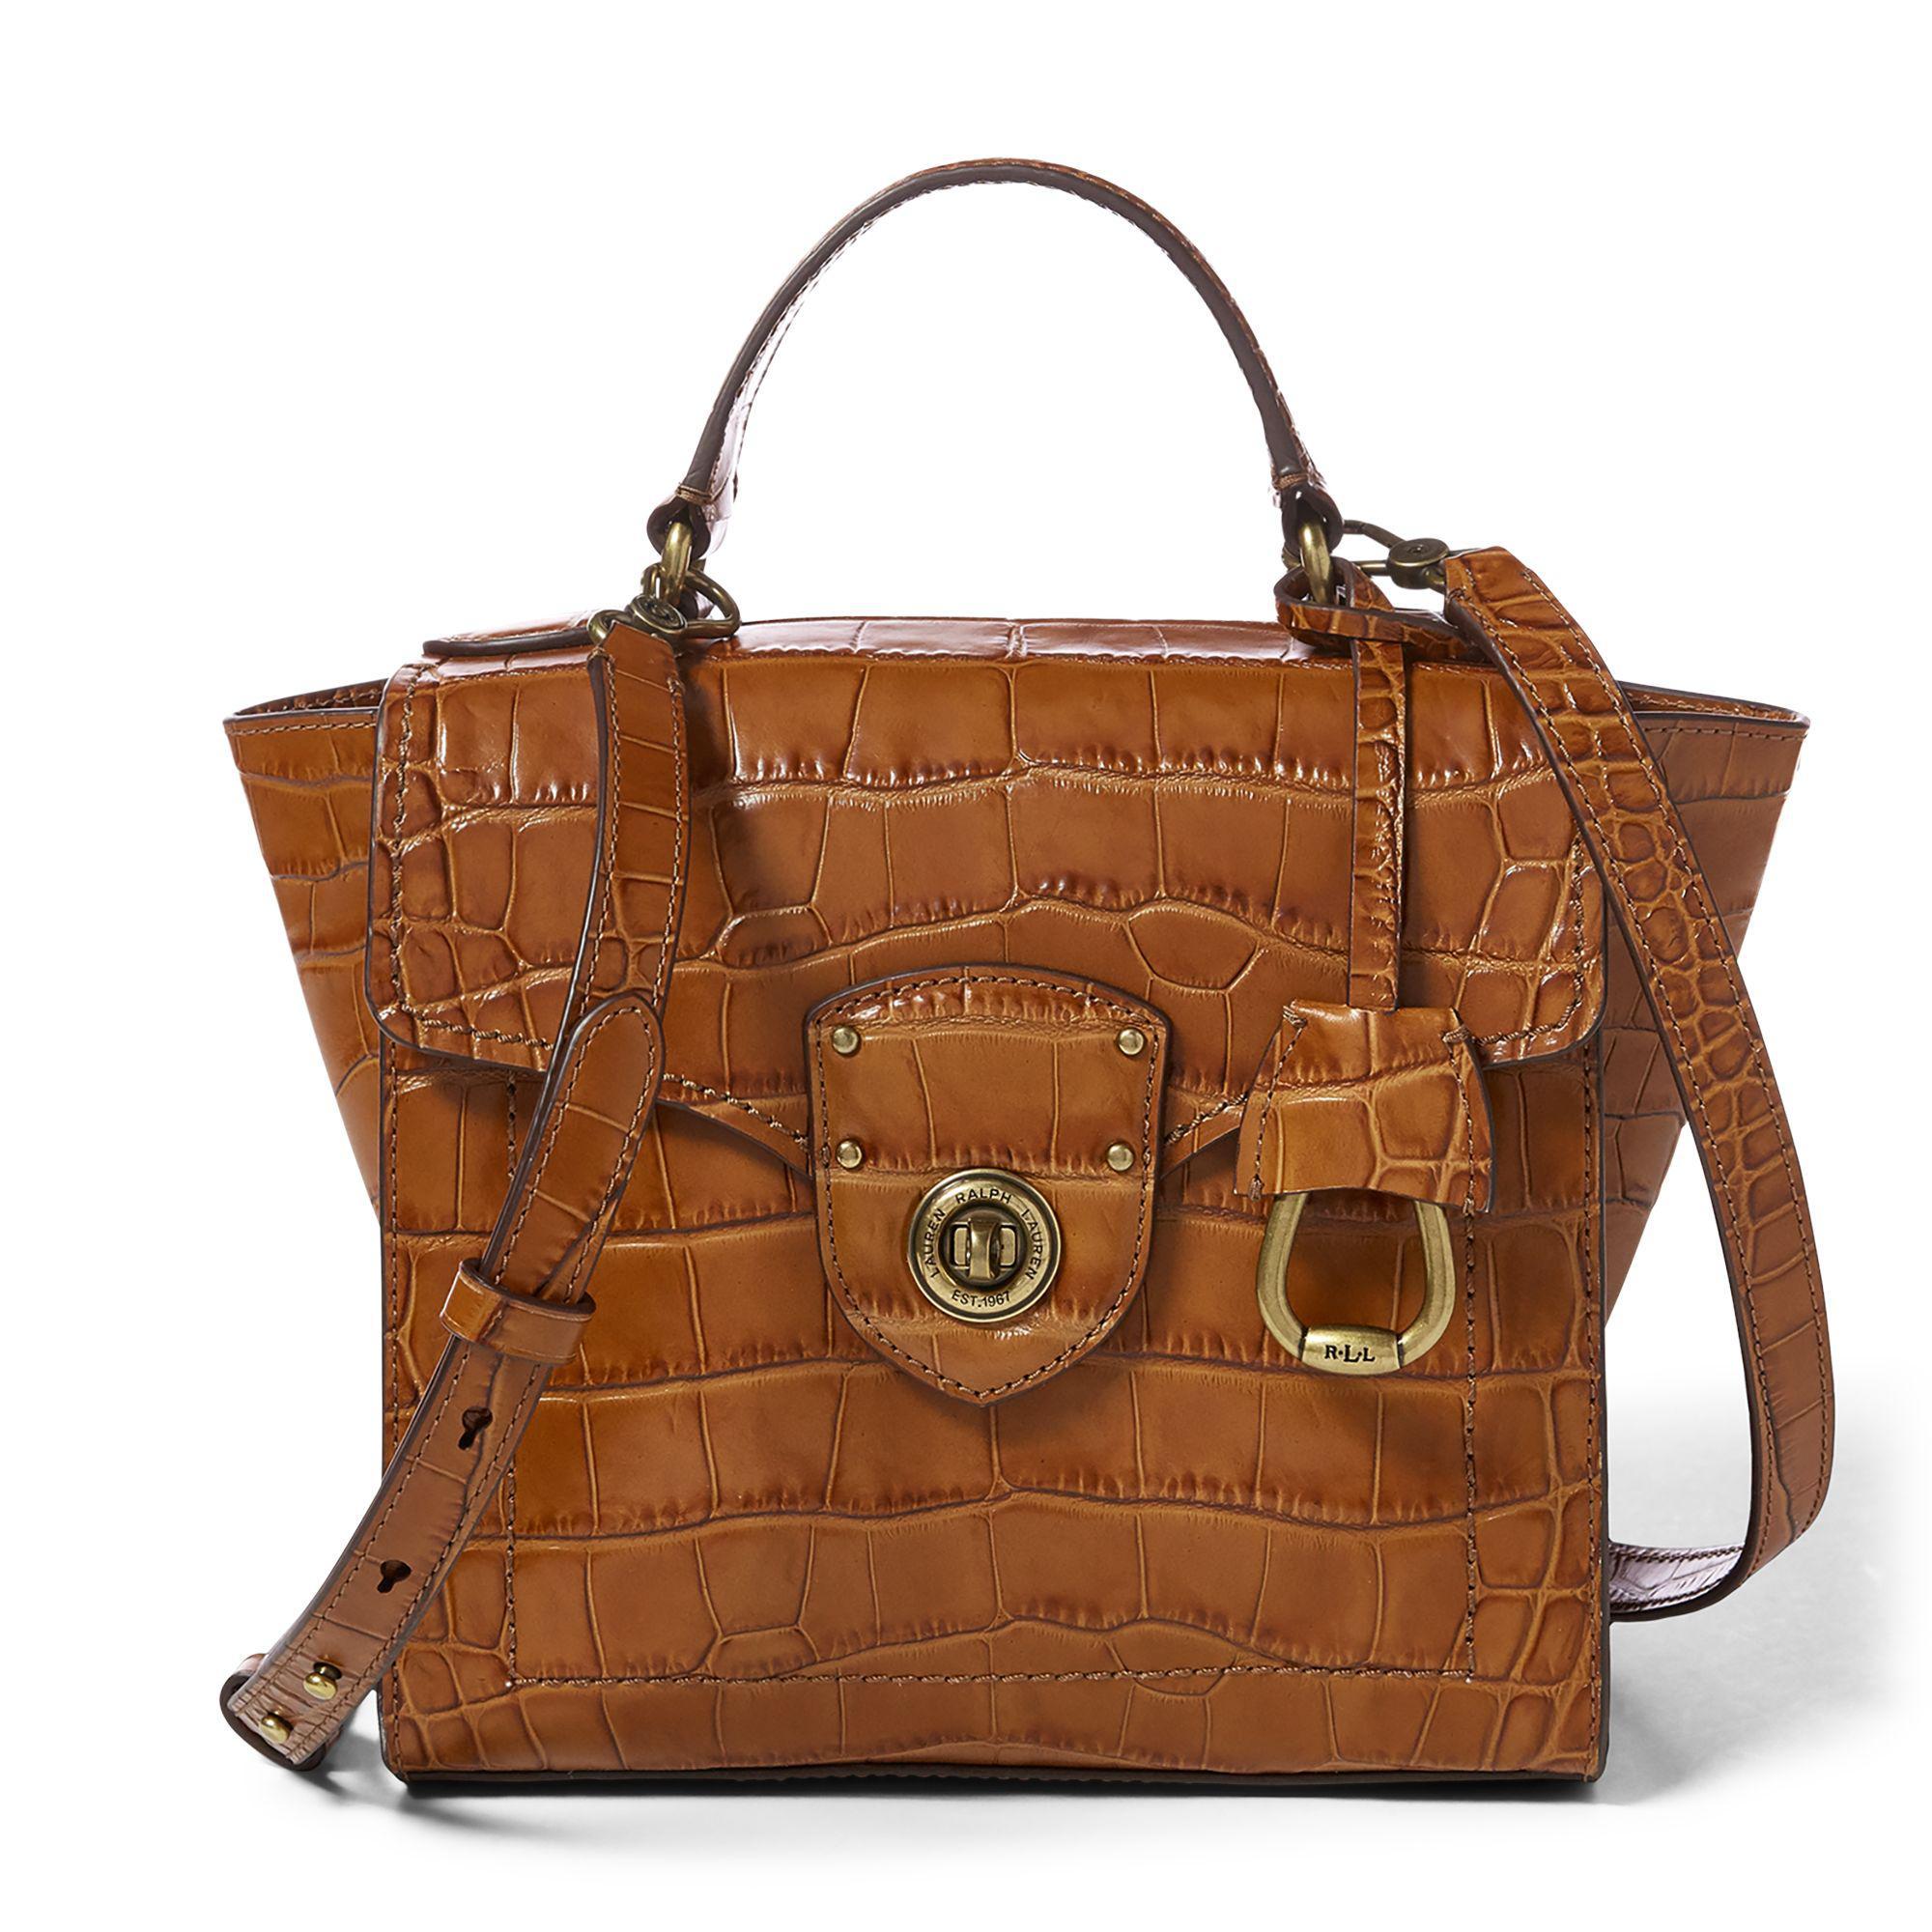 e50bb2159a1d Ralph Lauren Leather Satchel in Brown - Lyst